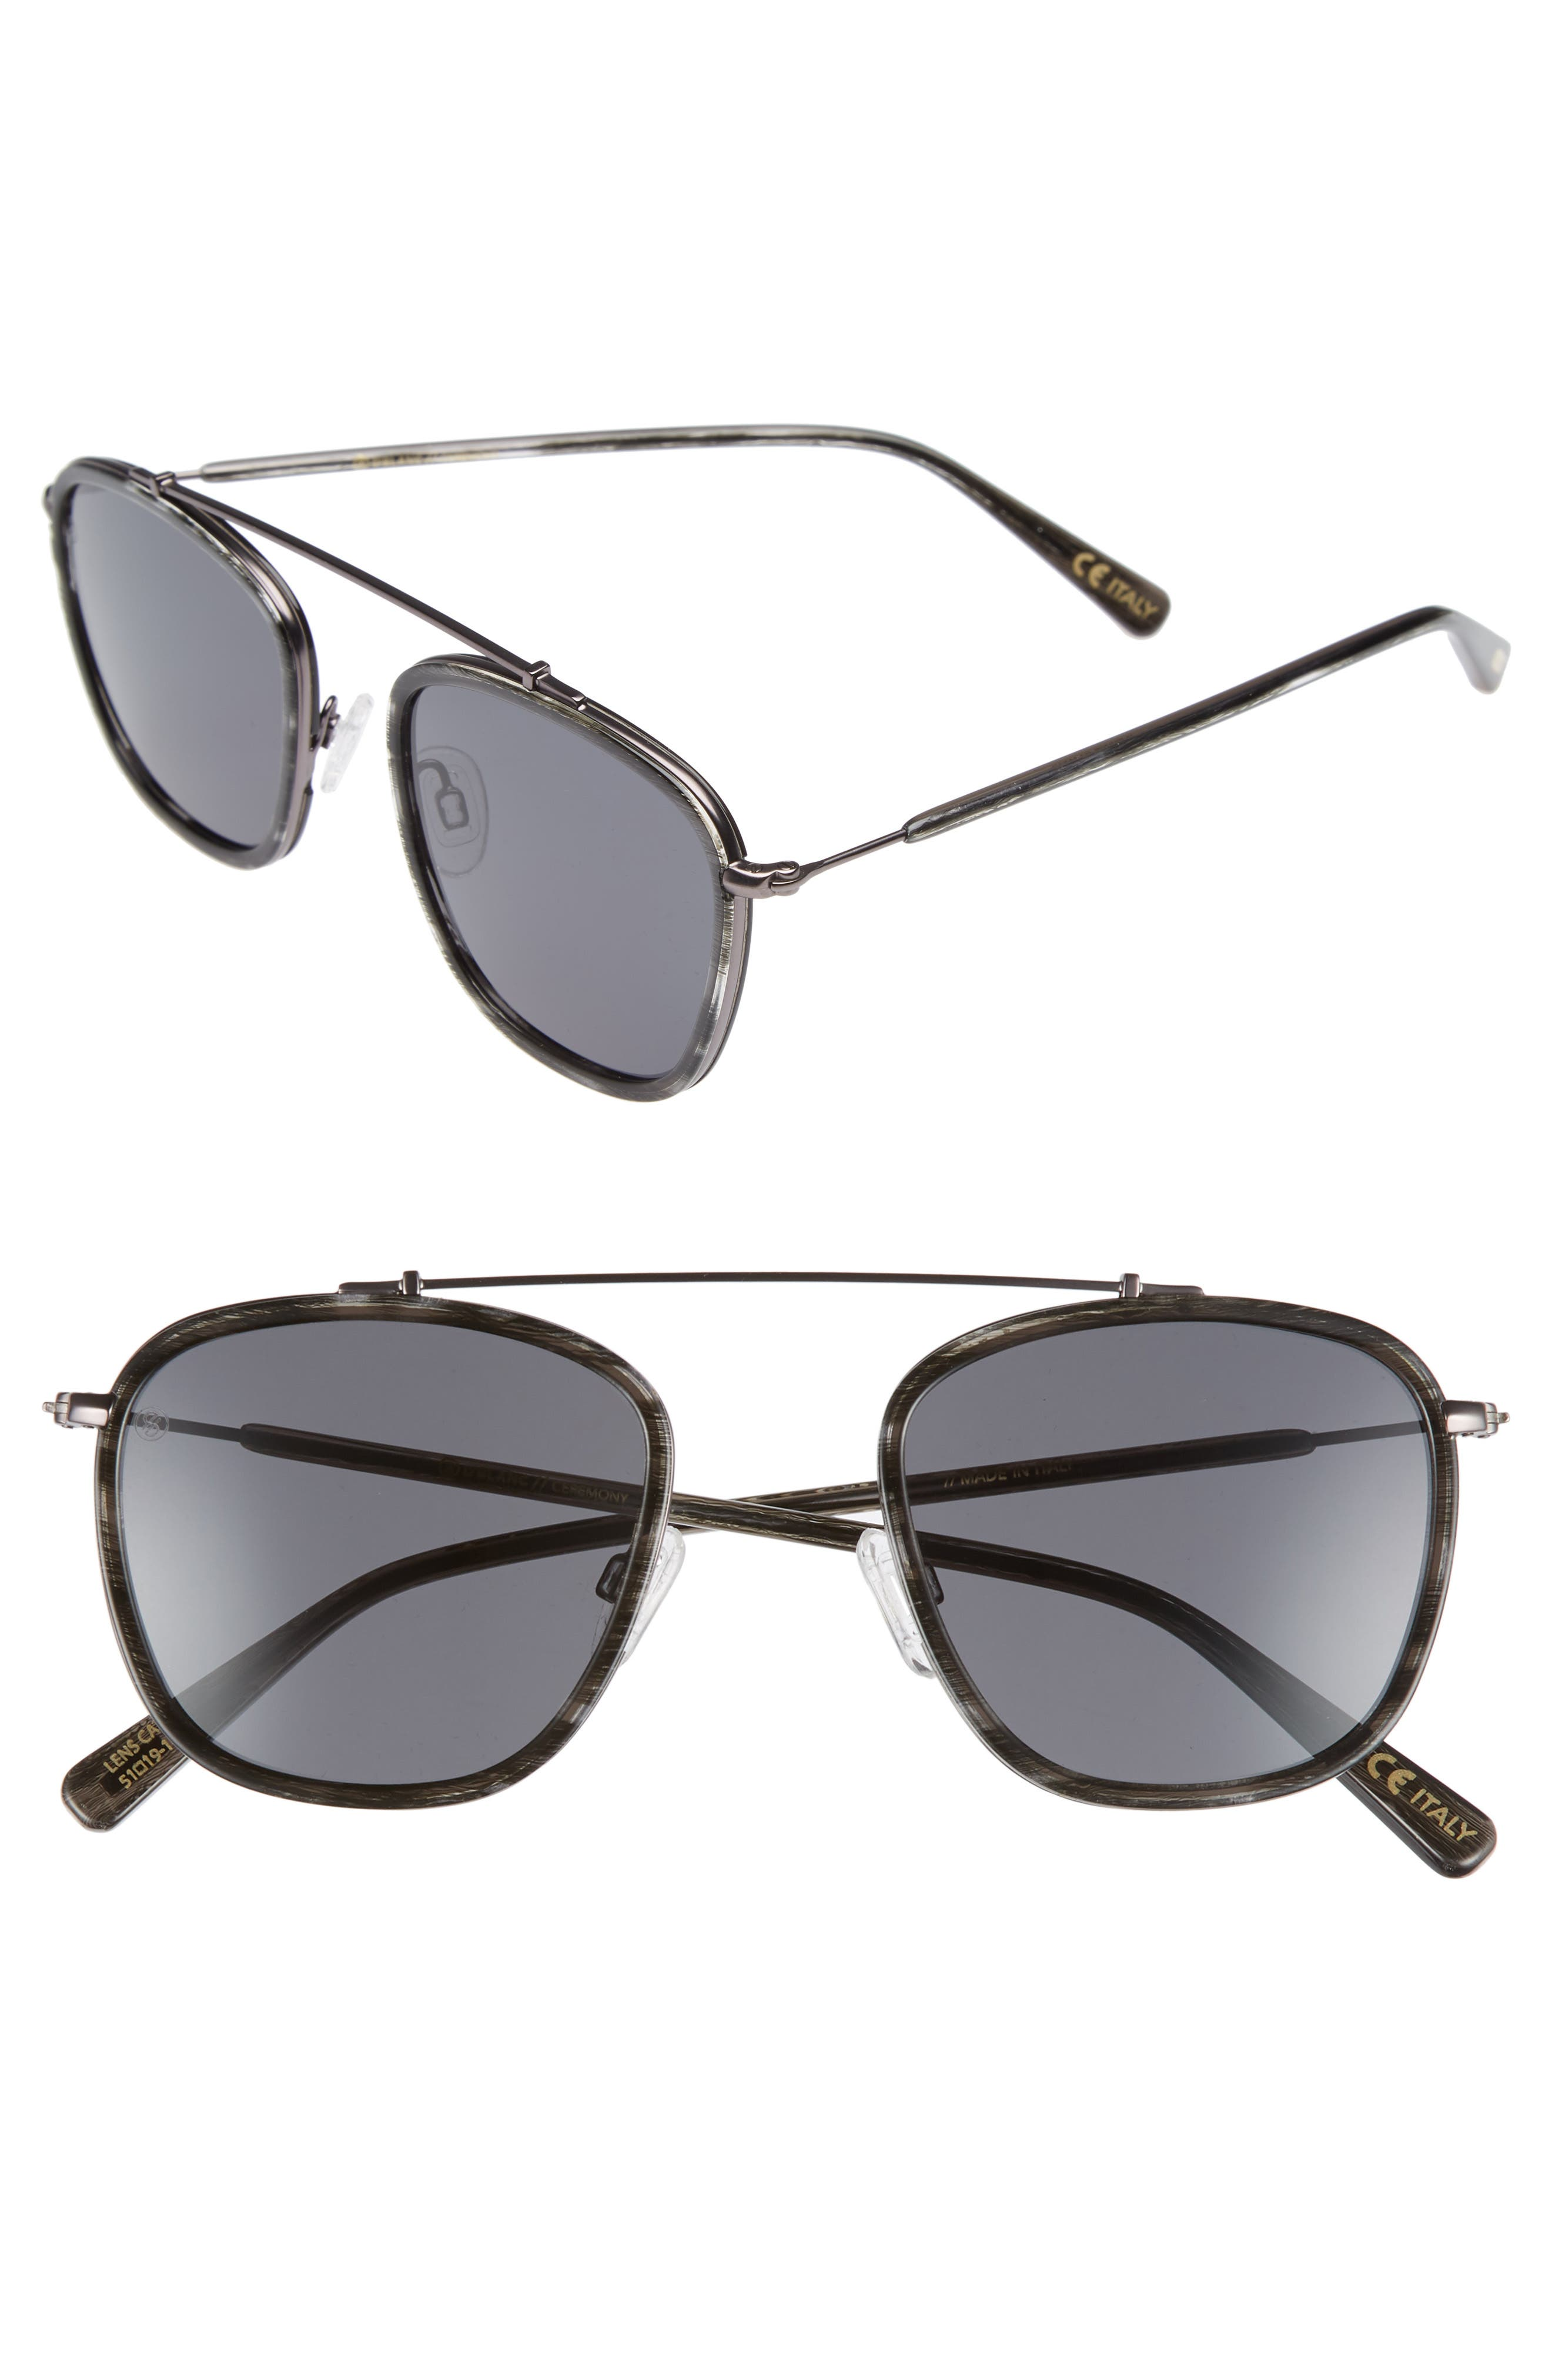 D'BLANC Ceremony 51mm Square Sunglasses,                         Main,                         color, 001